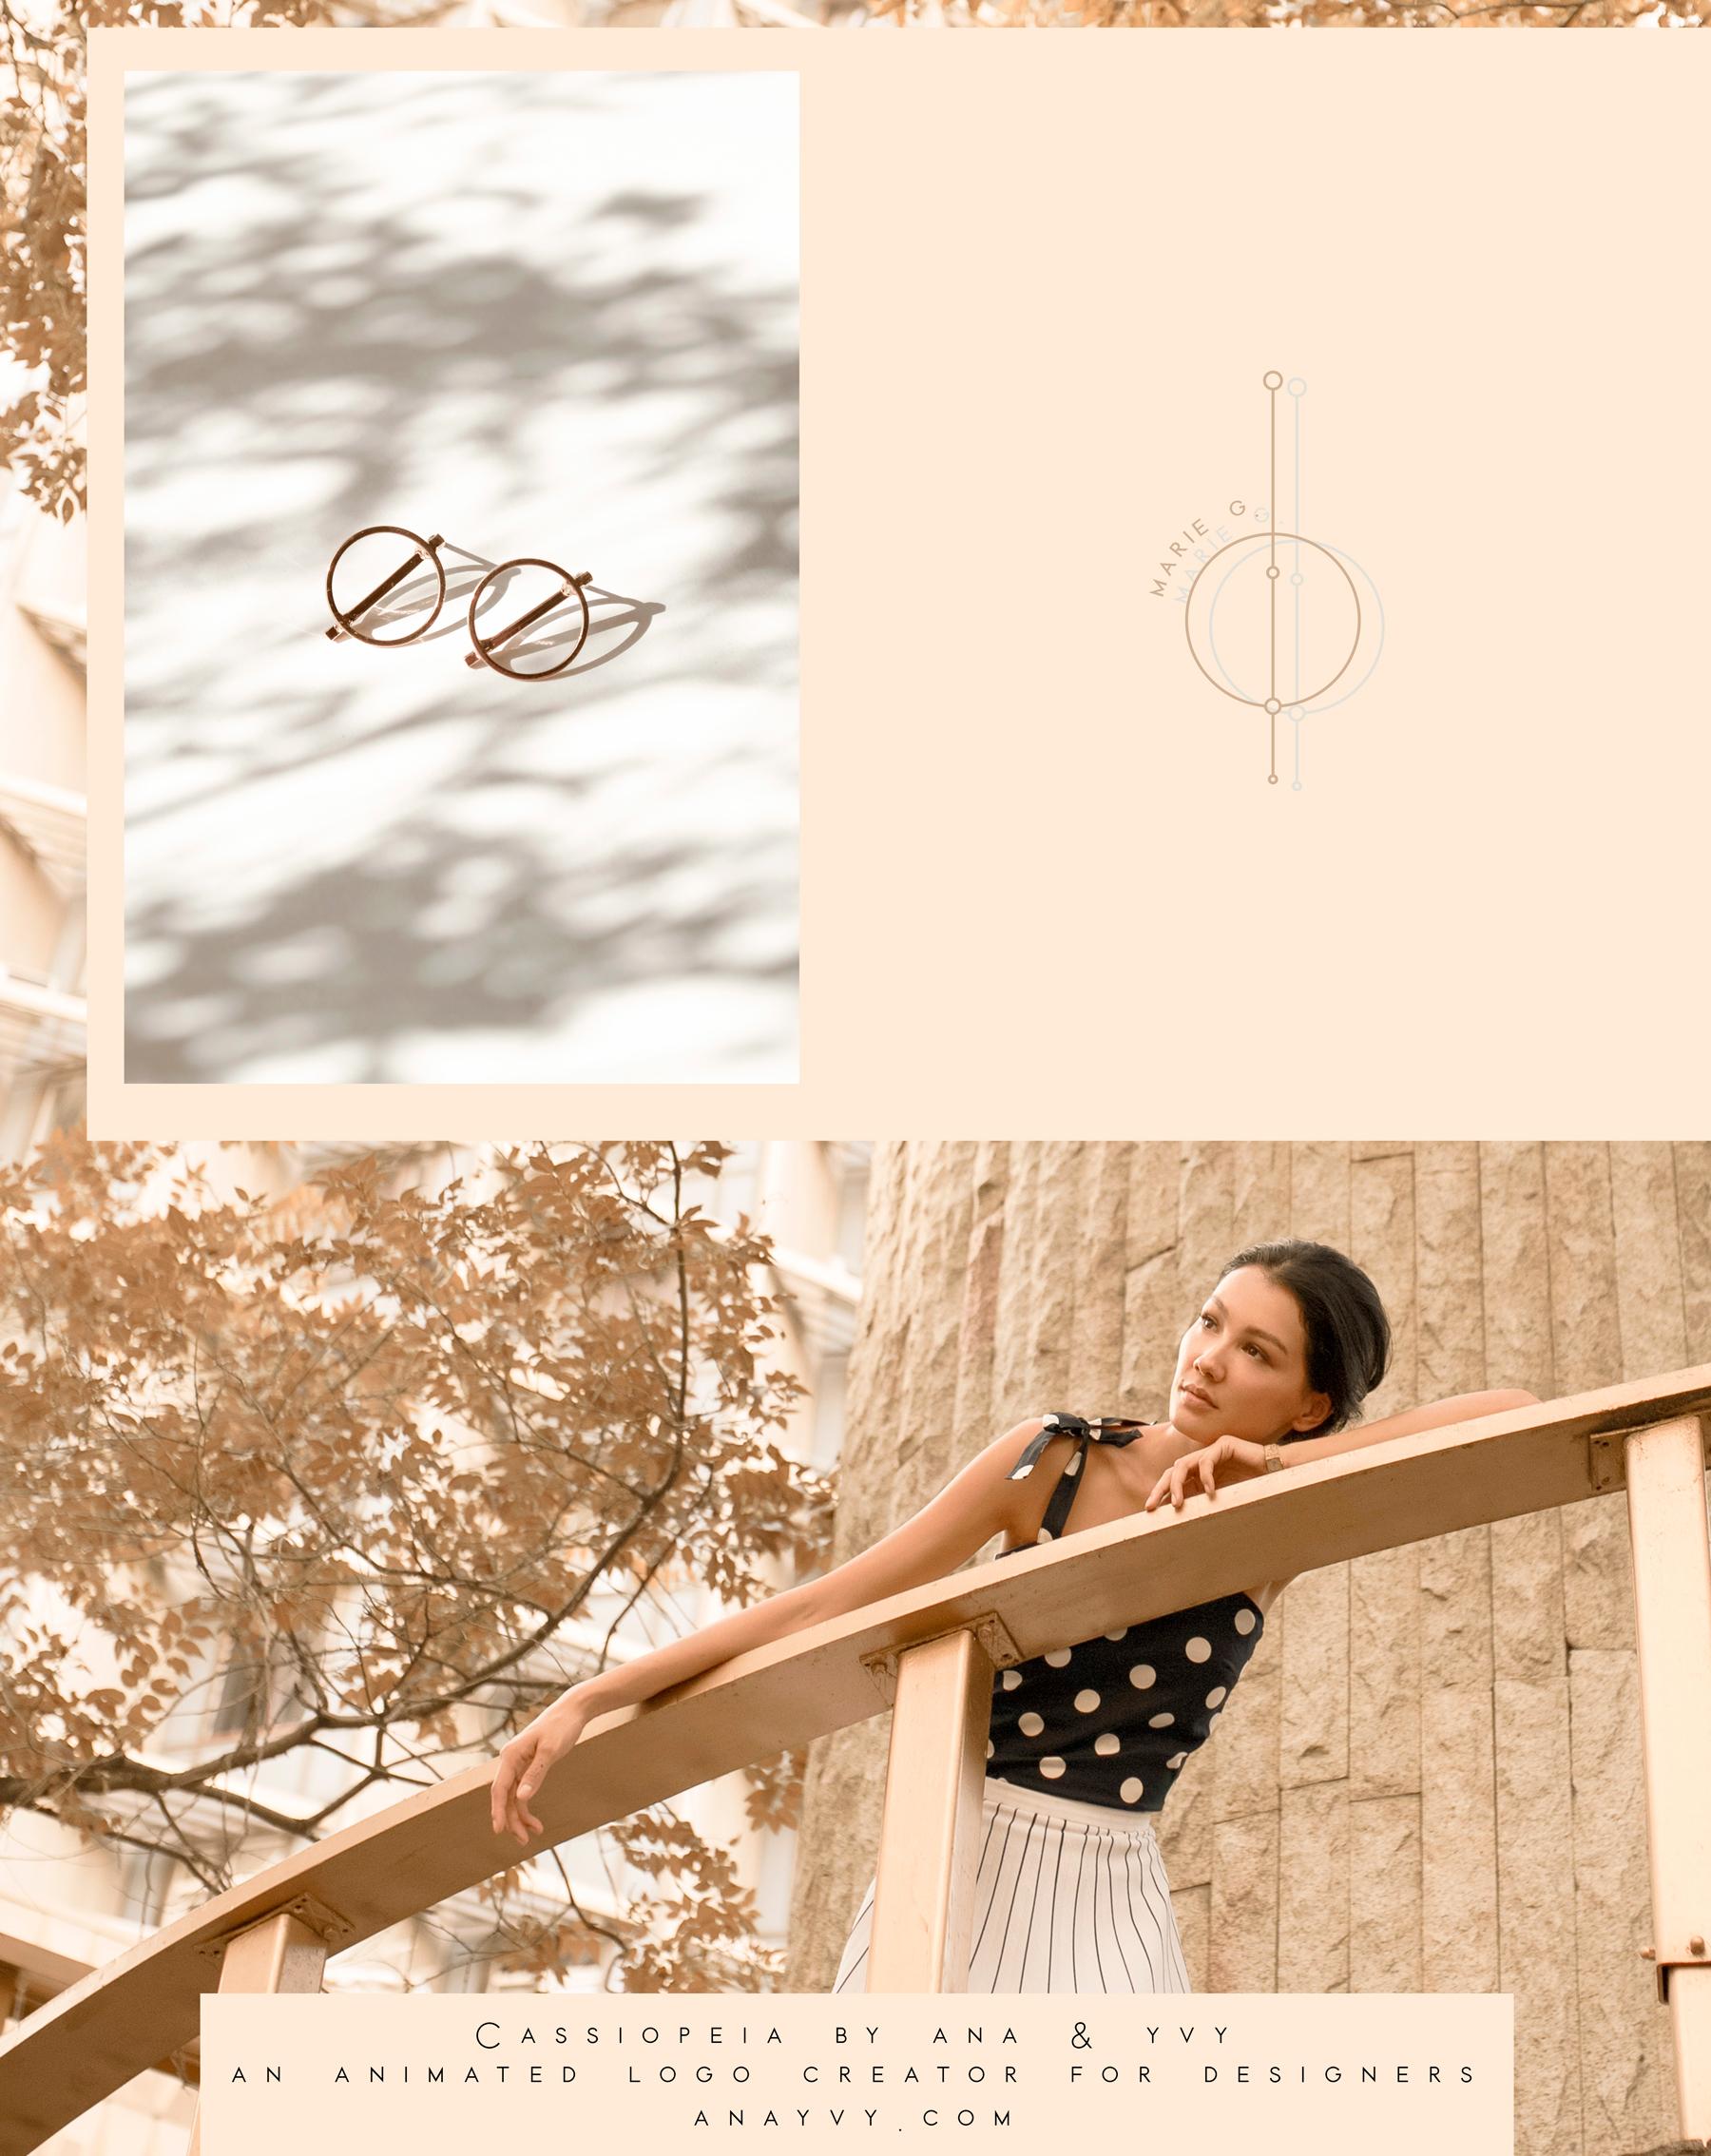 Cassiopeia-logo-design-animation-anayvy-motion-vintage-hand-greenery-apothecary-jewlery-2